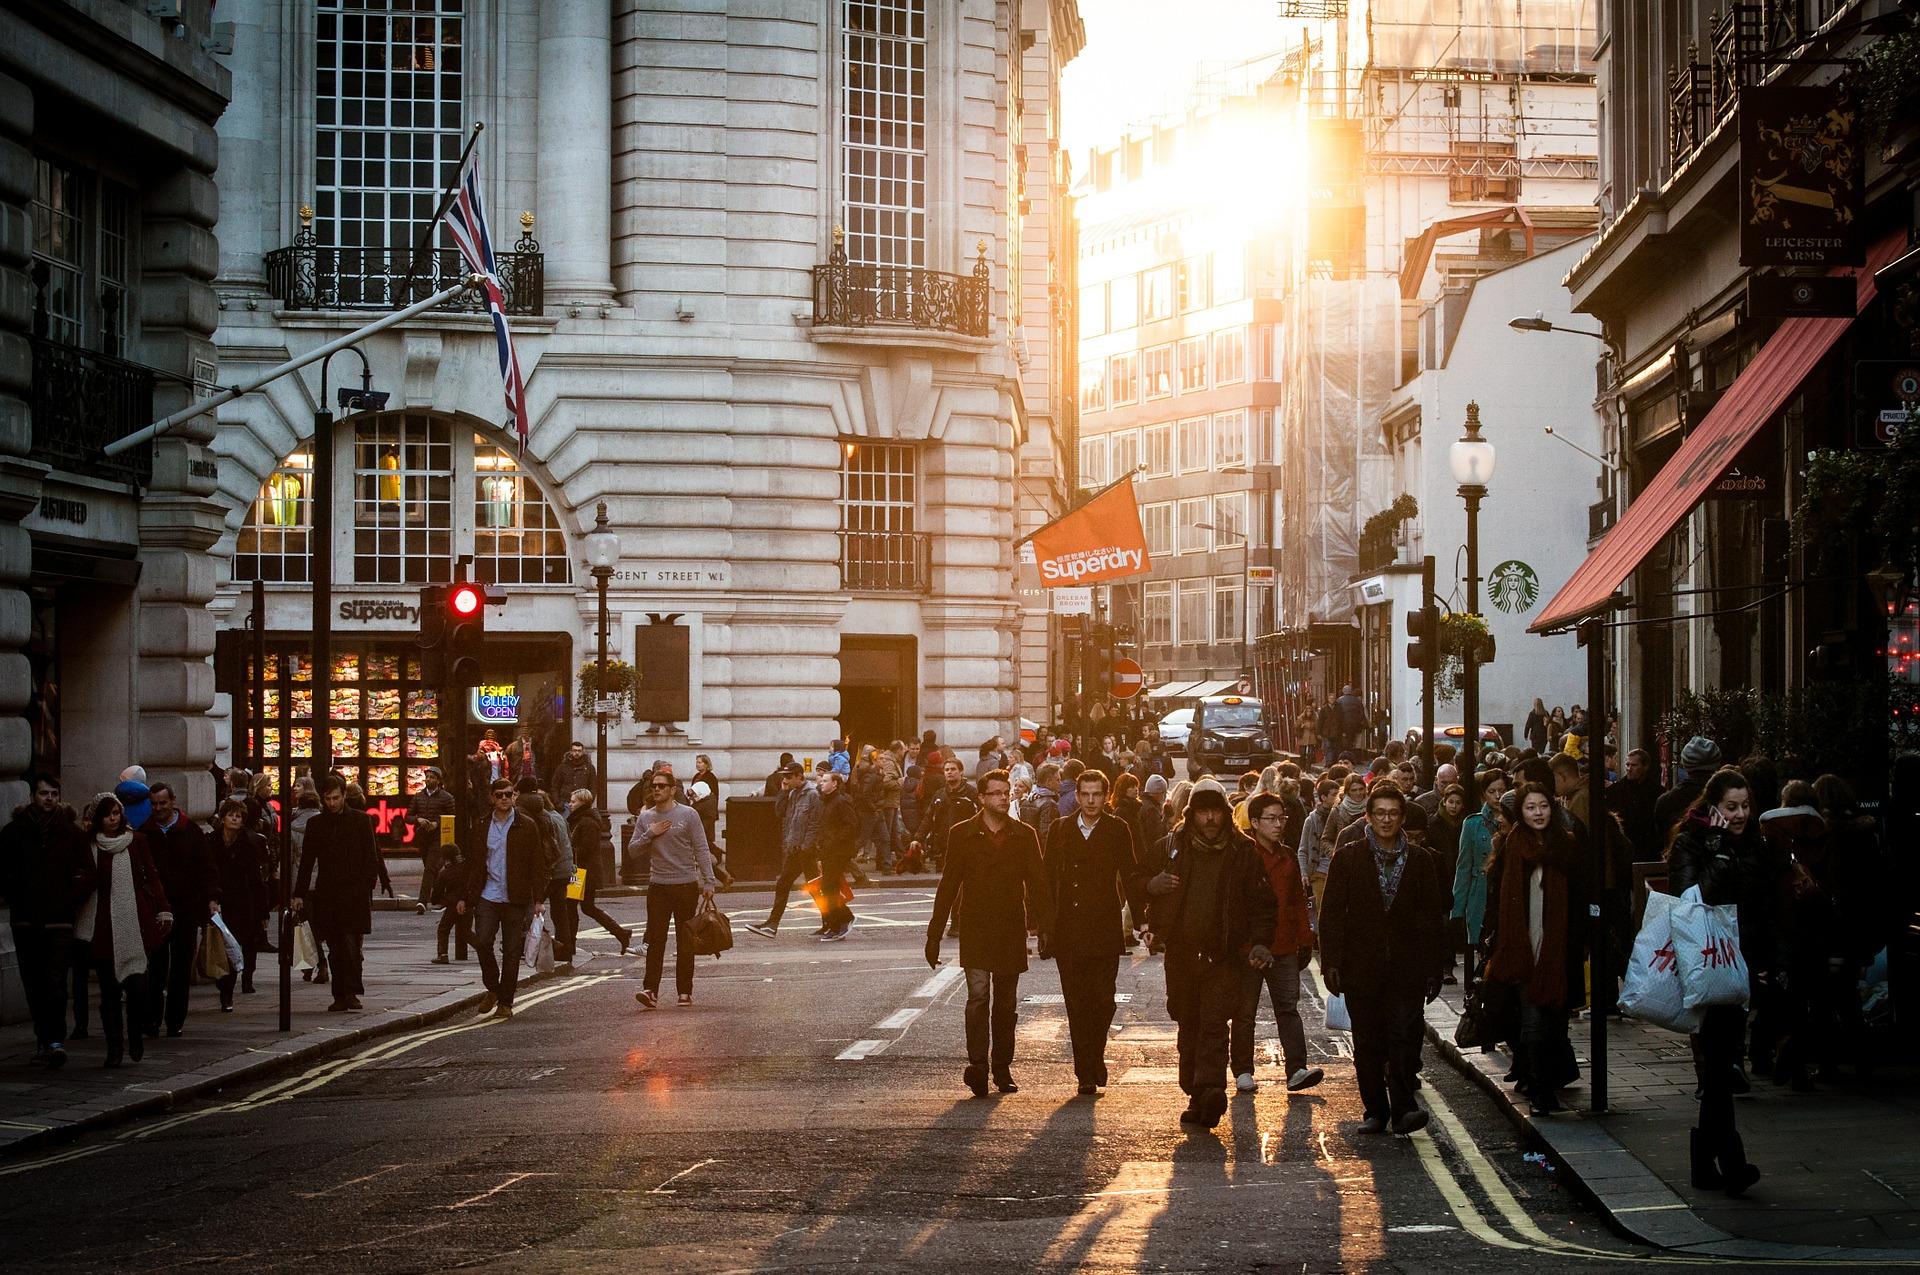 UK Consumer Law